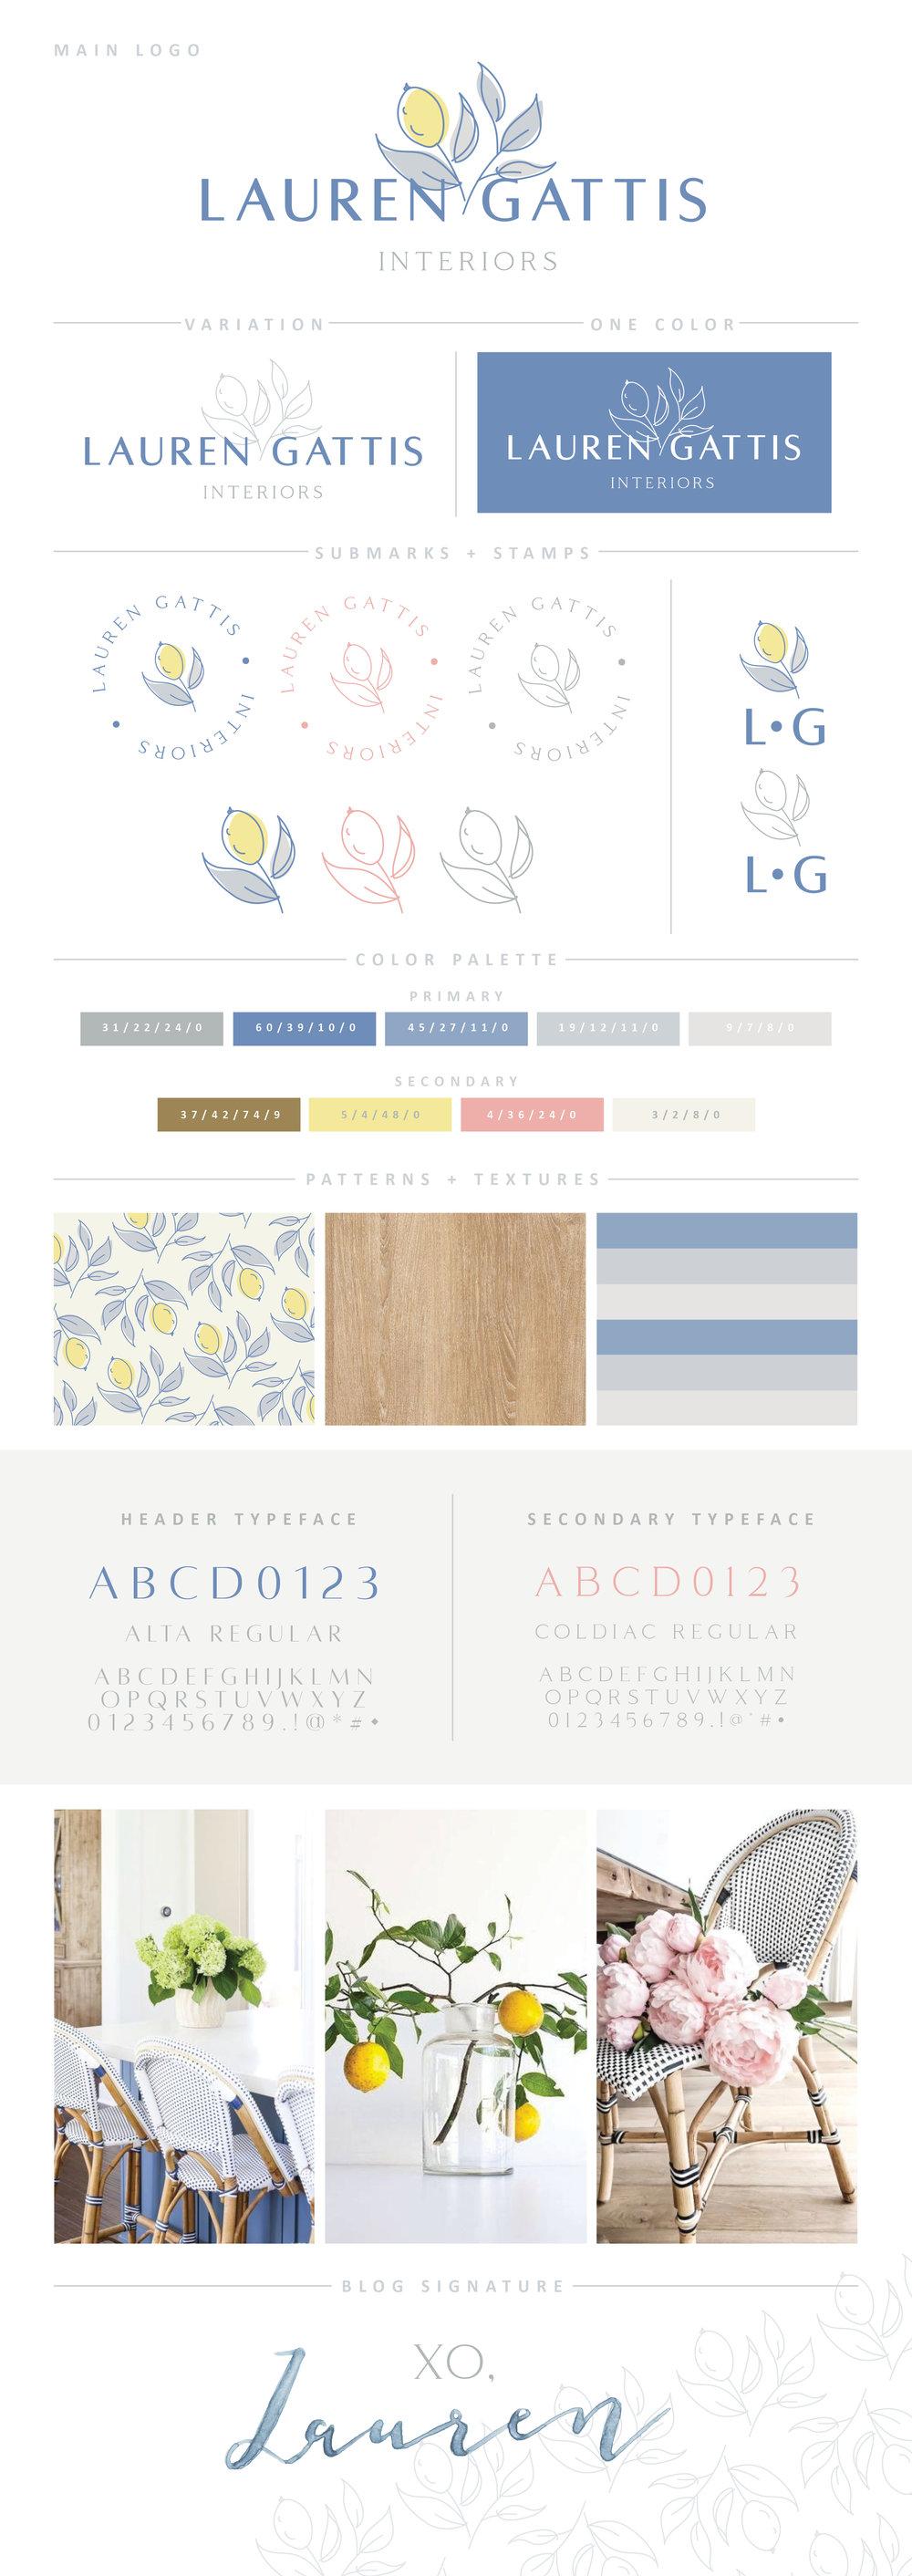 Lauren Gattis Interiors_Brand Guide_011819.jpg